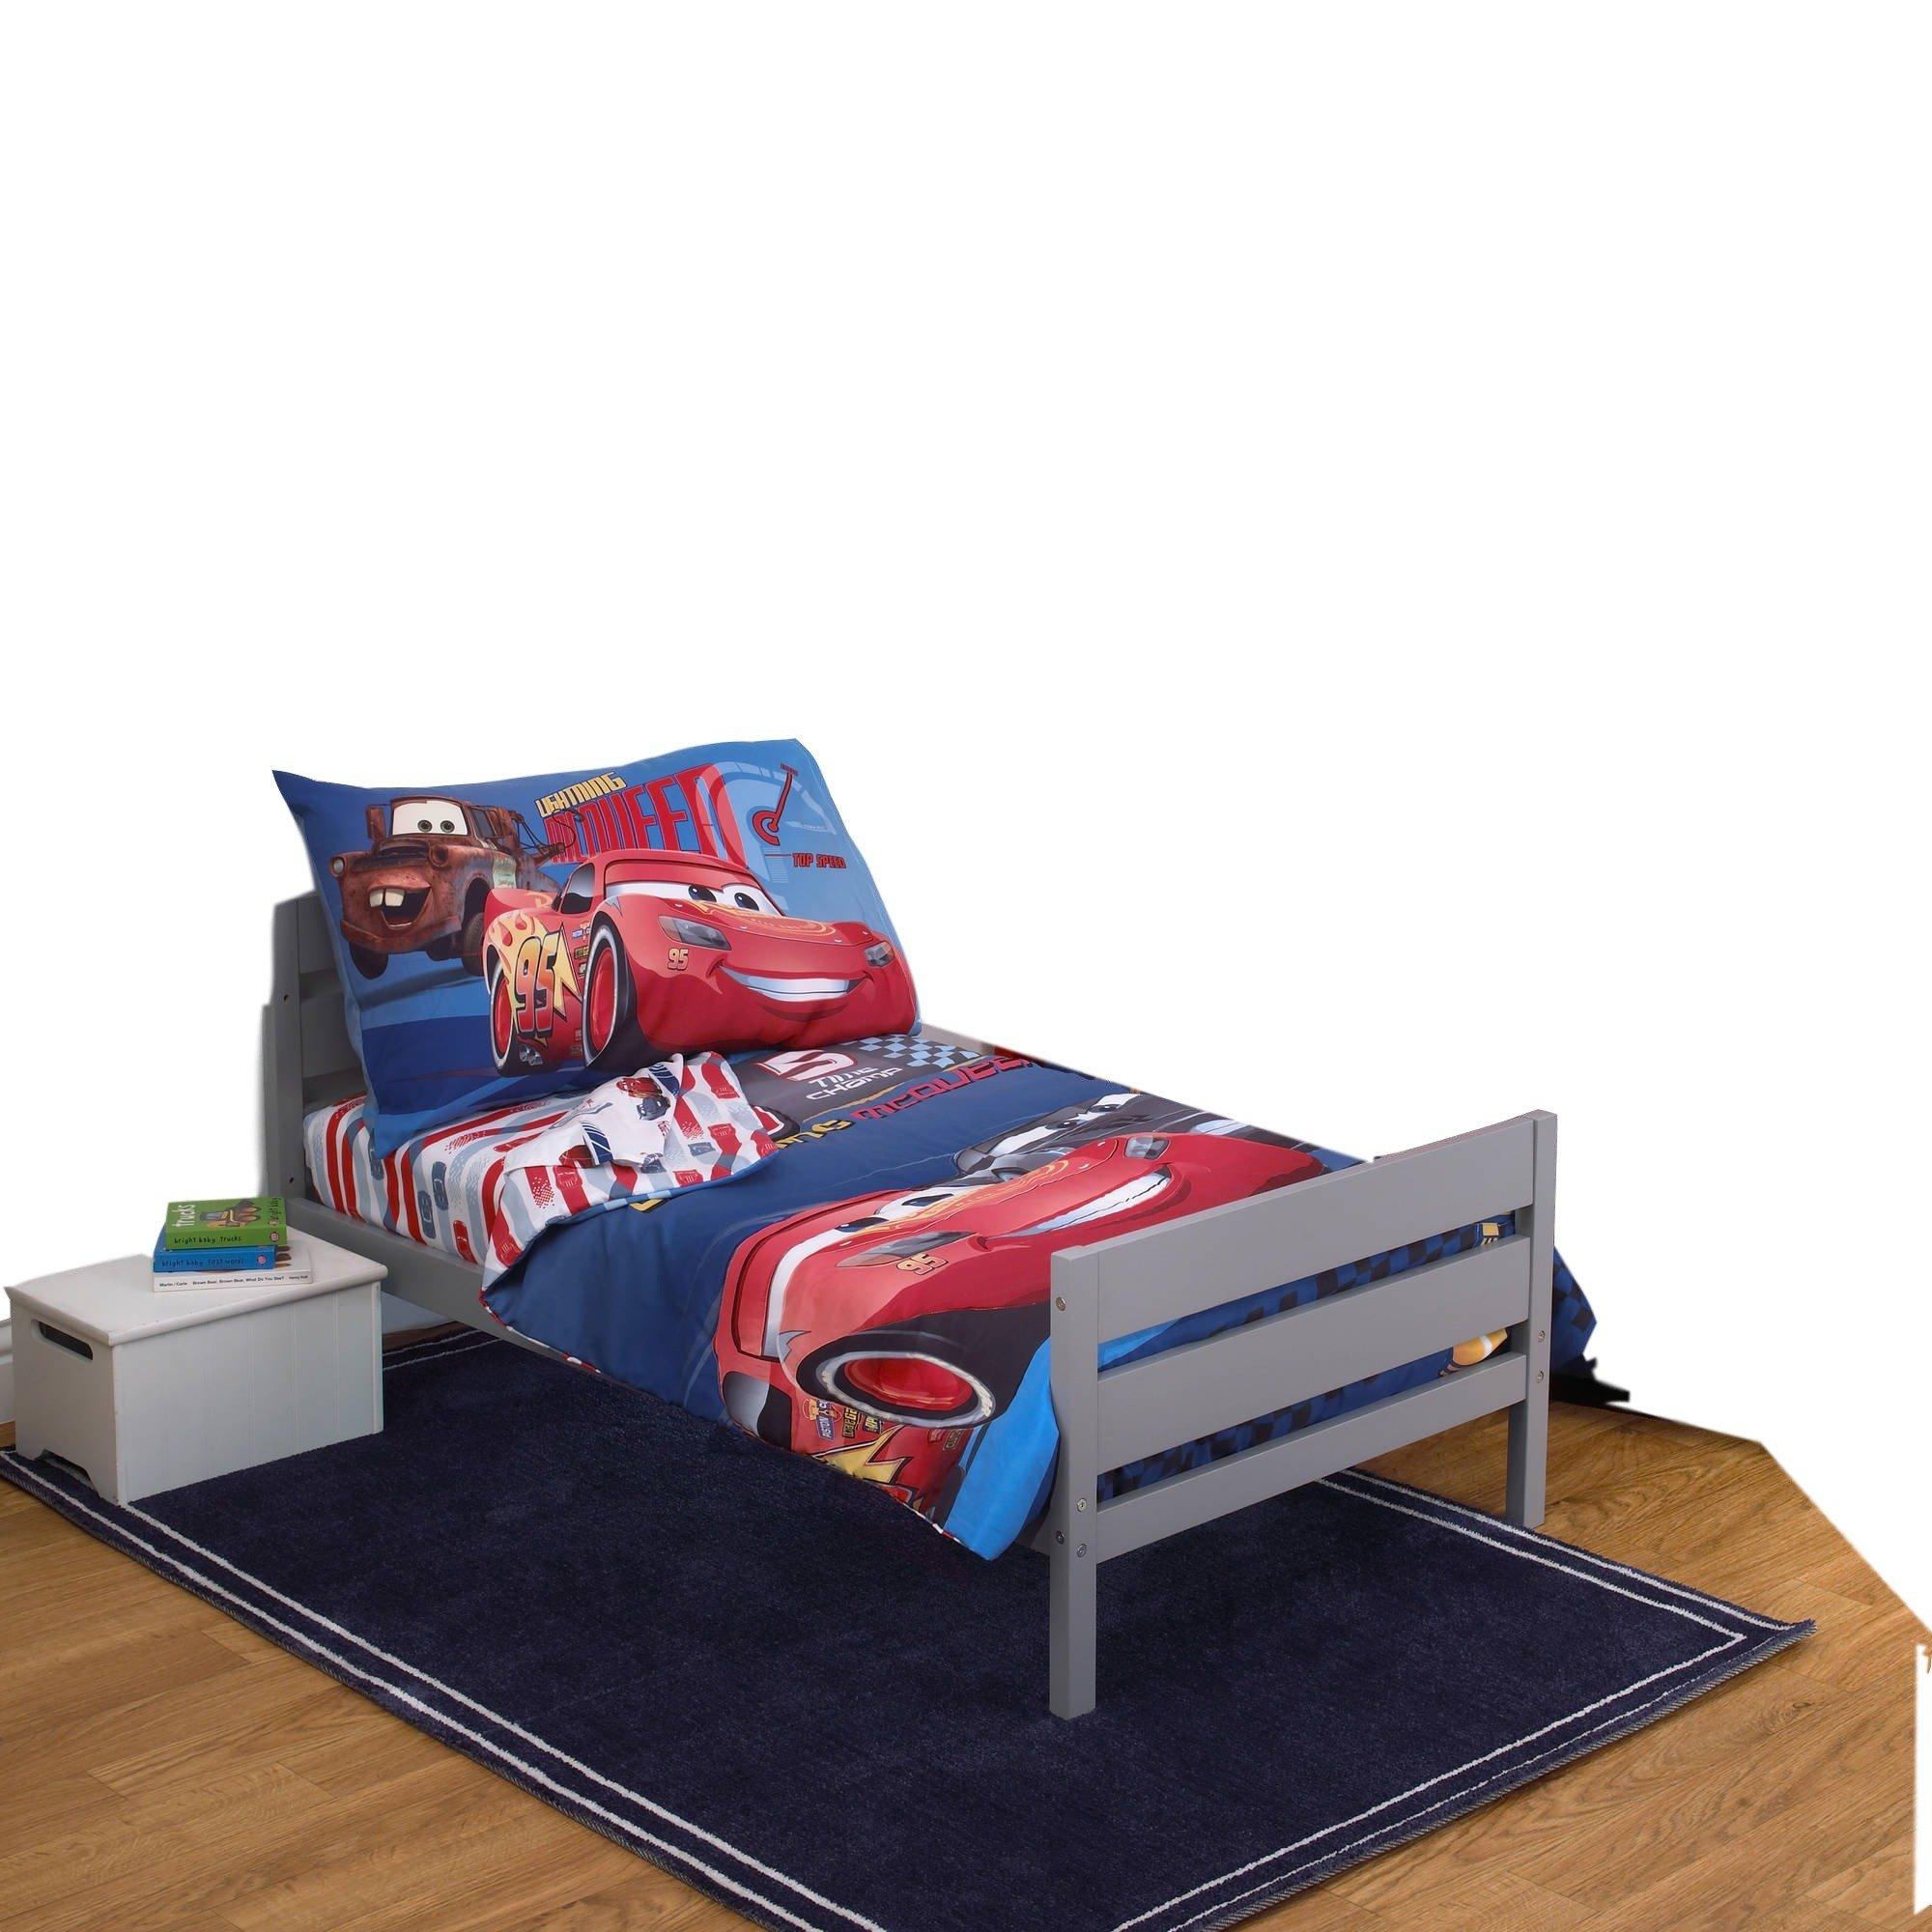 Disney Cars 3 Fast Not Last 4 Piece Toddler Bed Set McQueen Jackson Storm 20